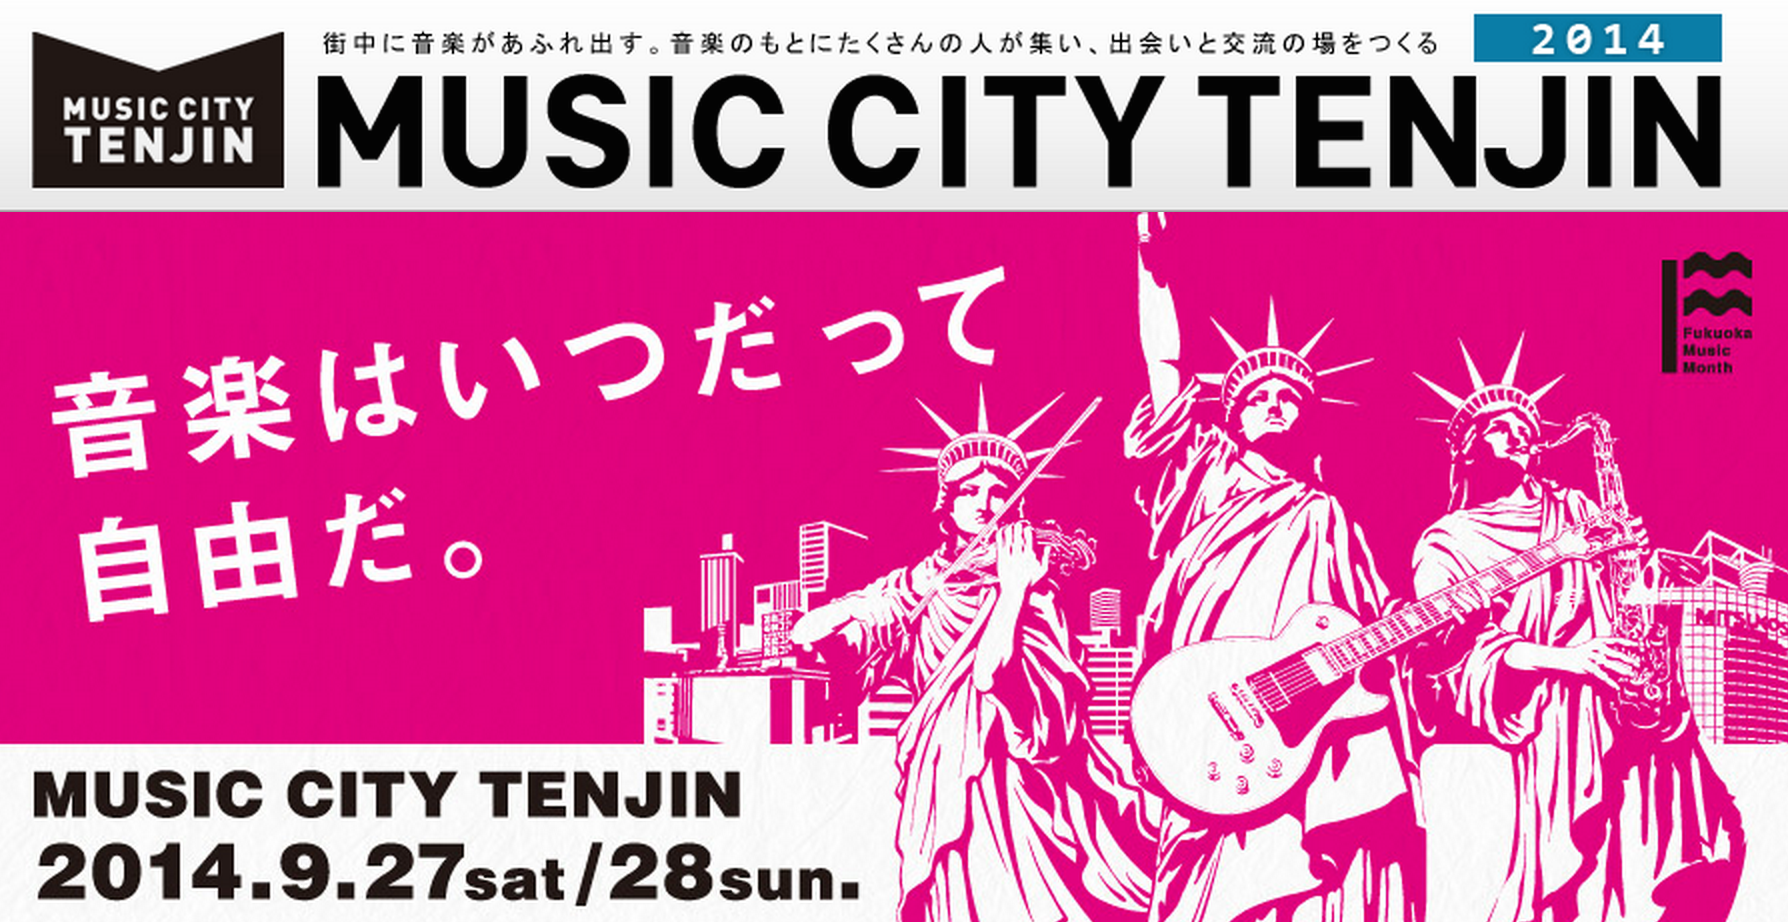 MUSIC CITY TENJIN